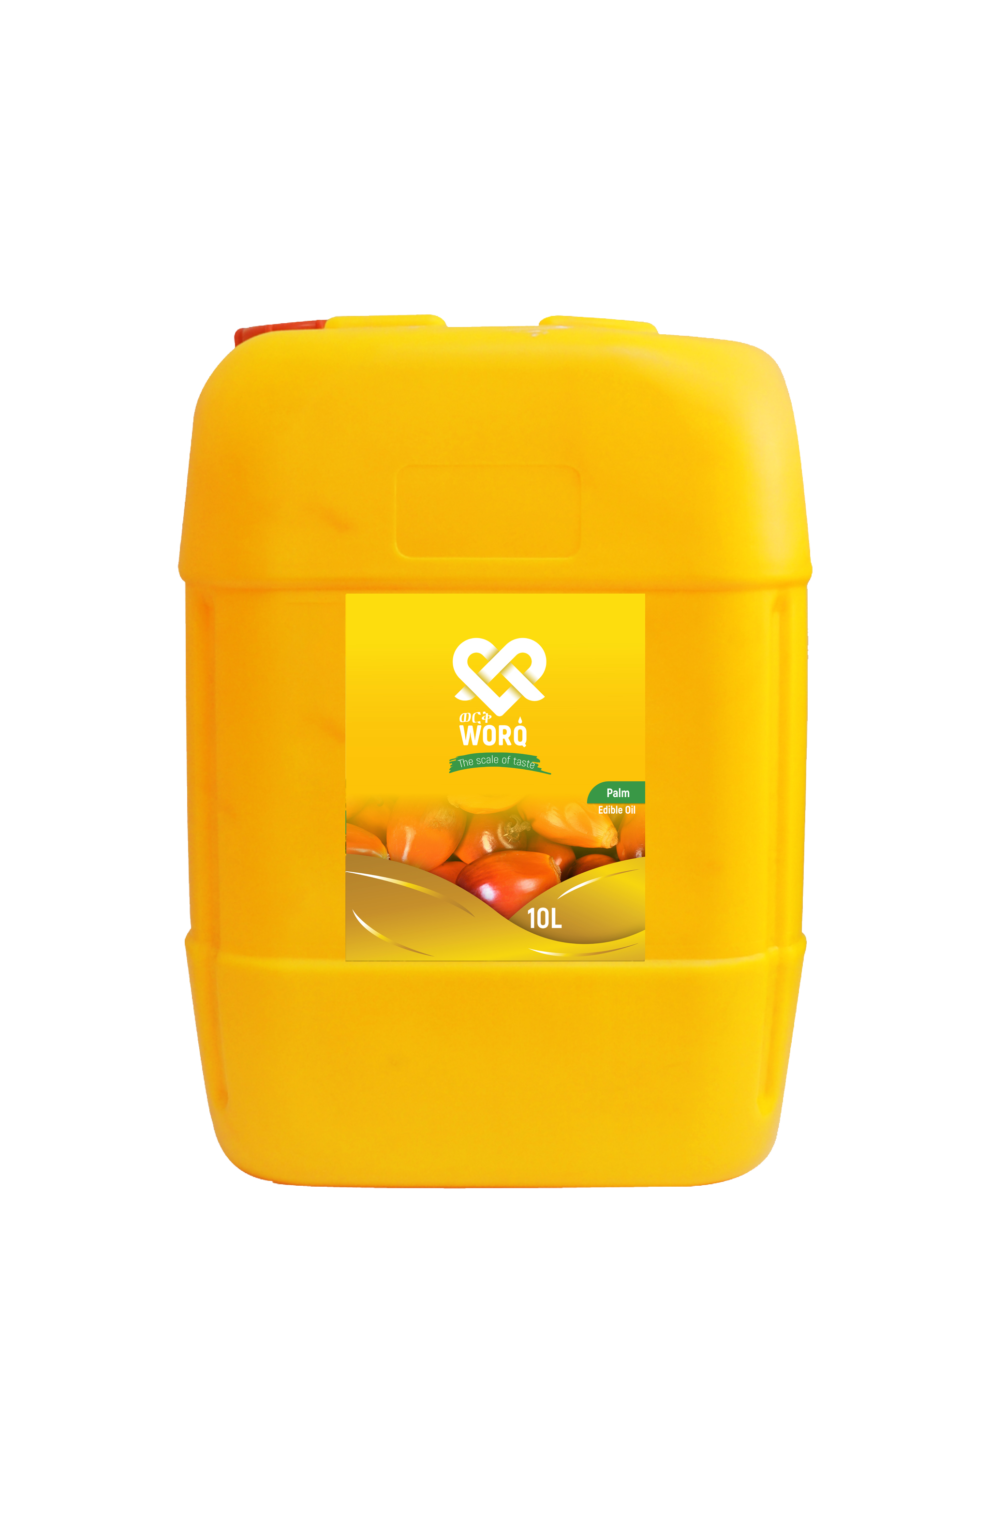 Worq Palm Oil 10 LMockup